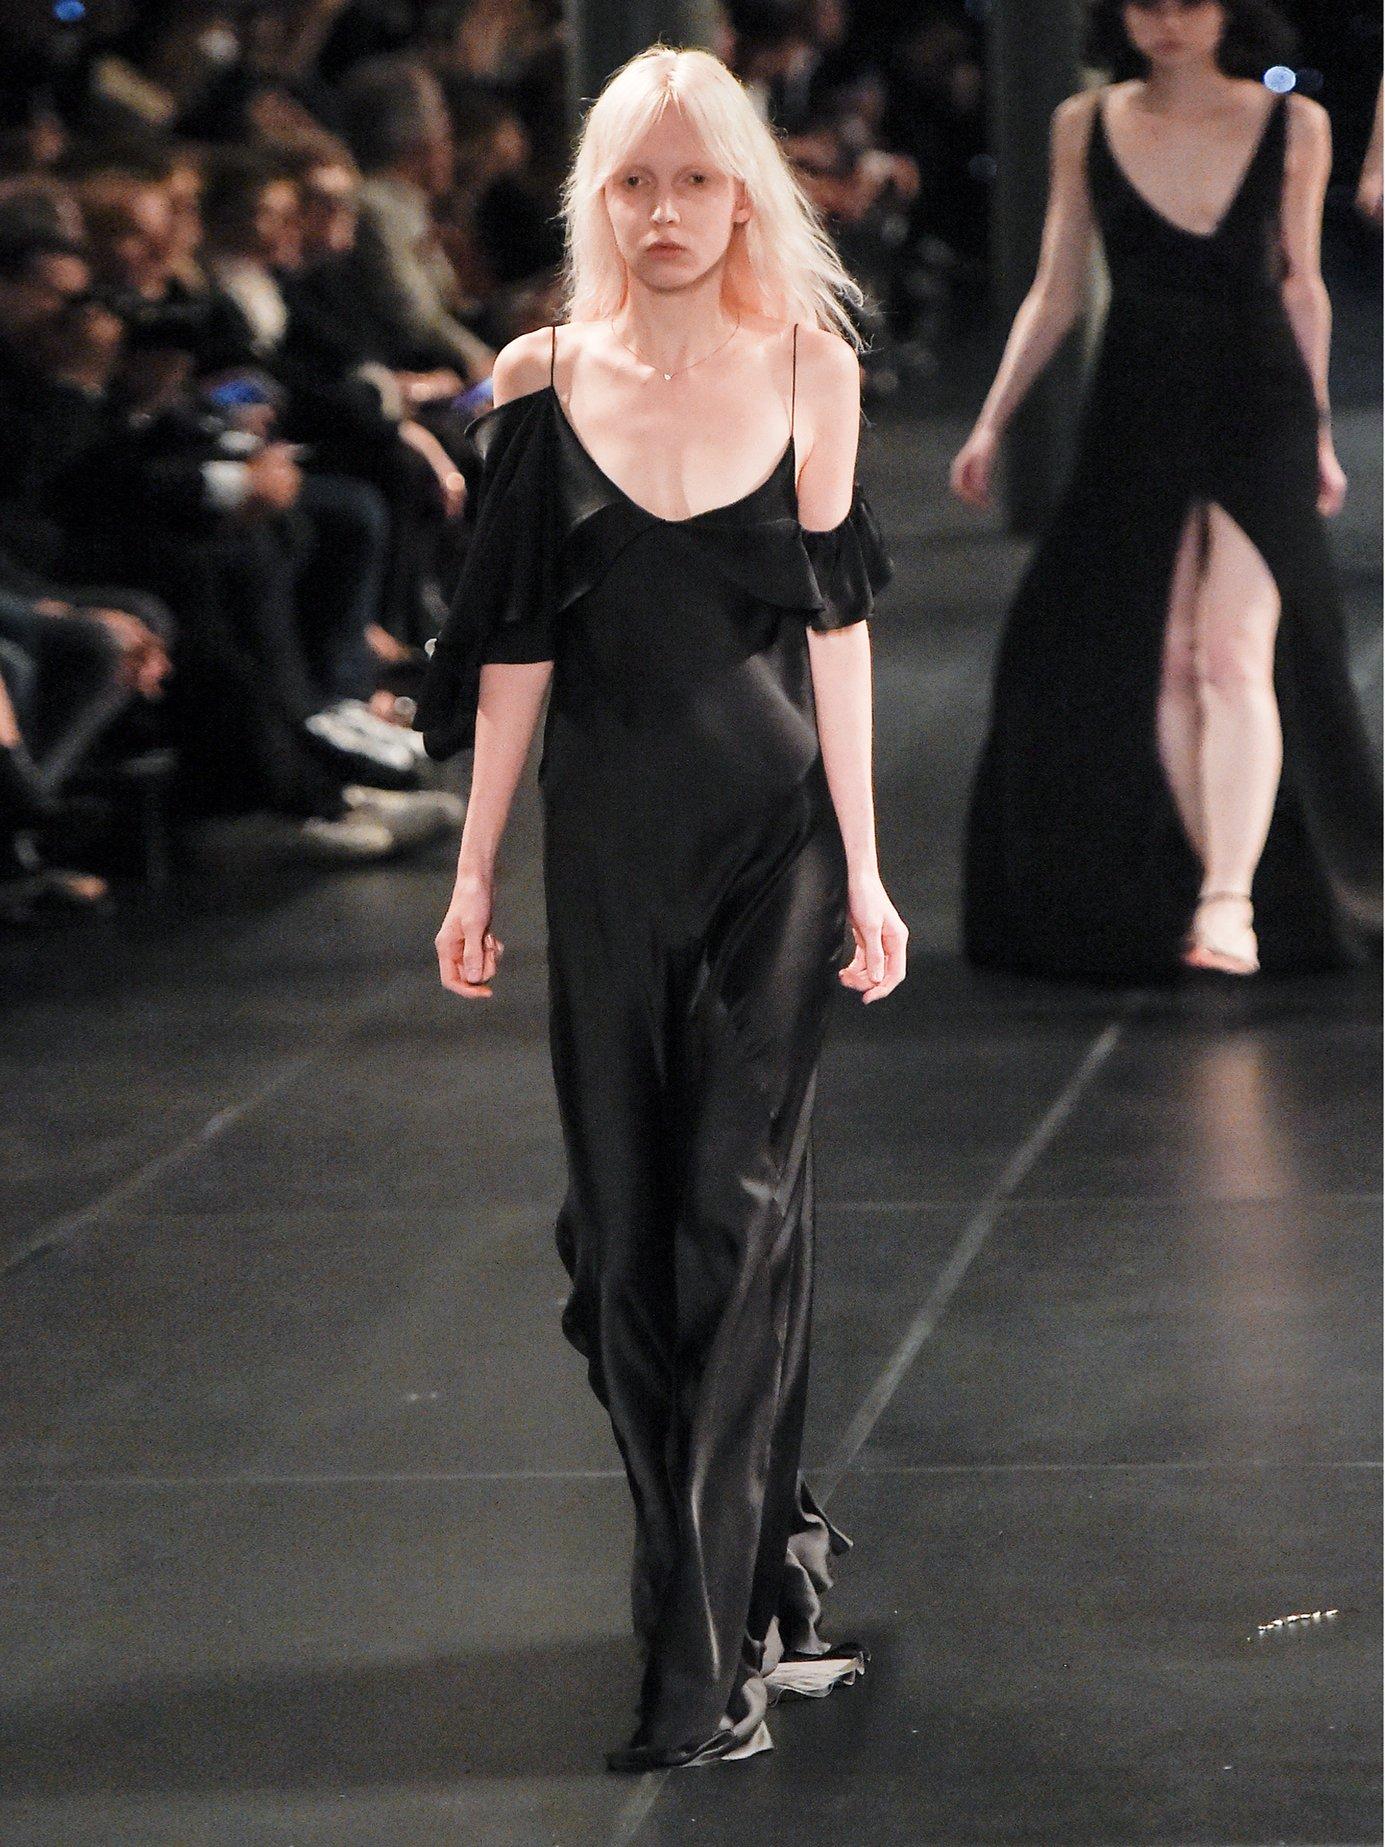 Evening Gowns Online | Designer Sales at Coshio Shop